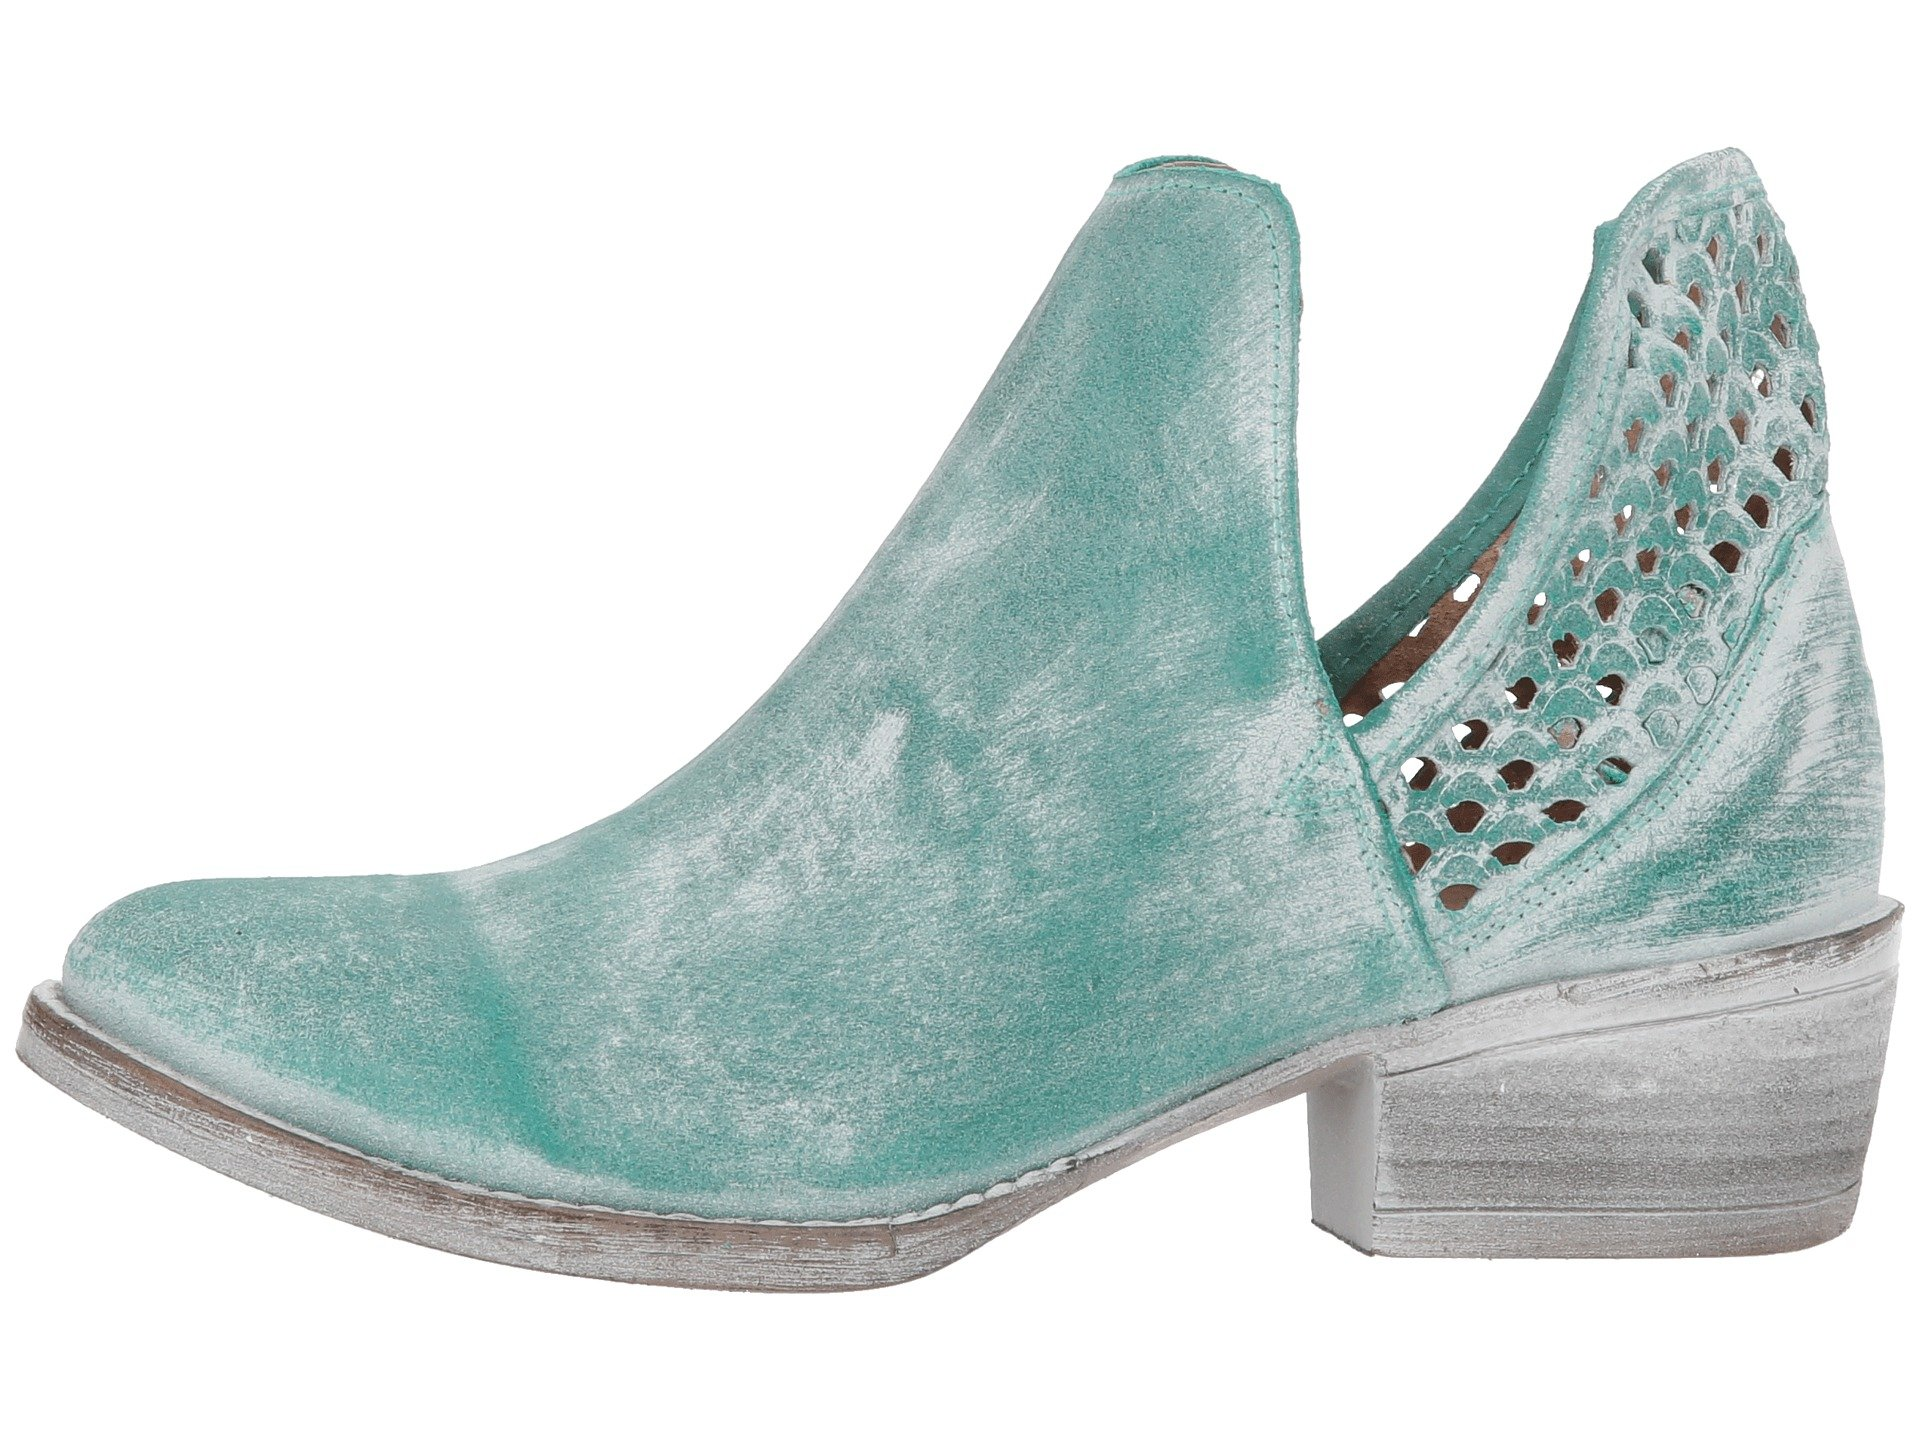 Turquoise Boots Q5026 Boots Q5026 Turquoise Boots Corral Corral Corral FHBqxw48